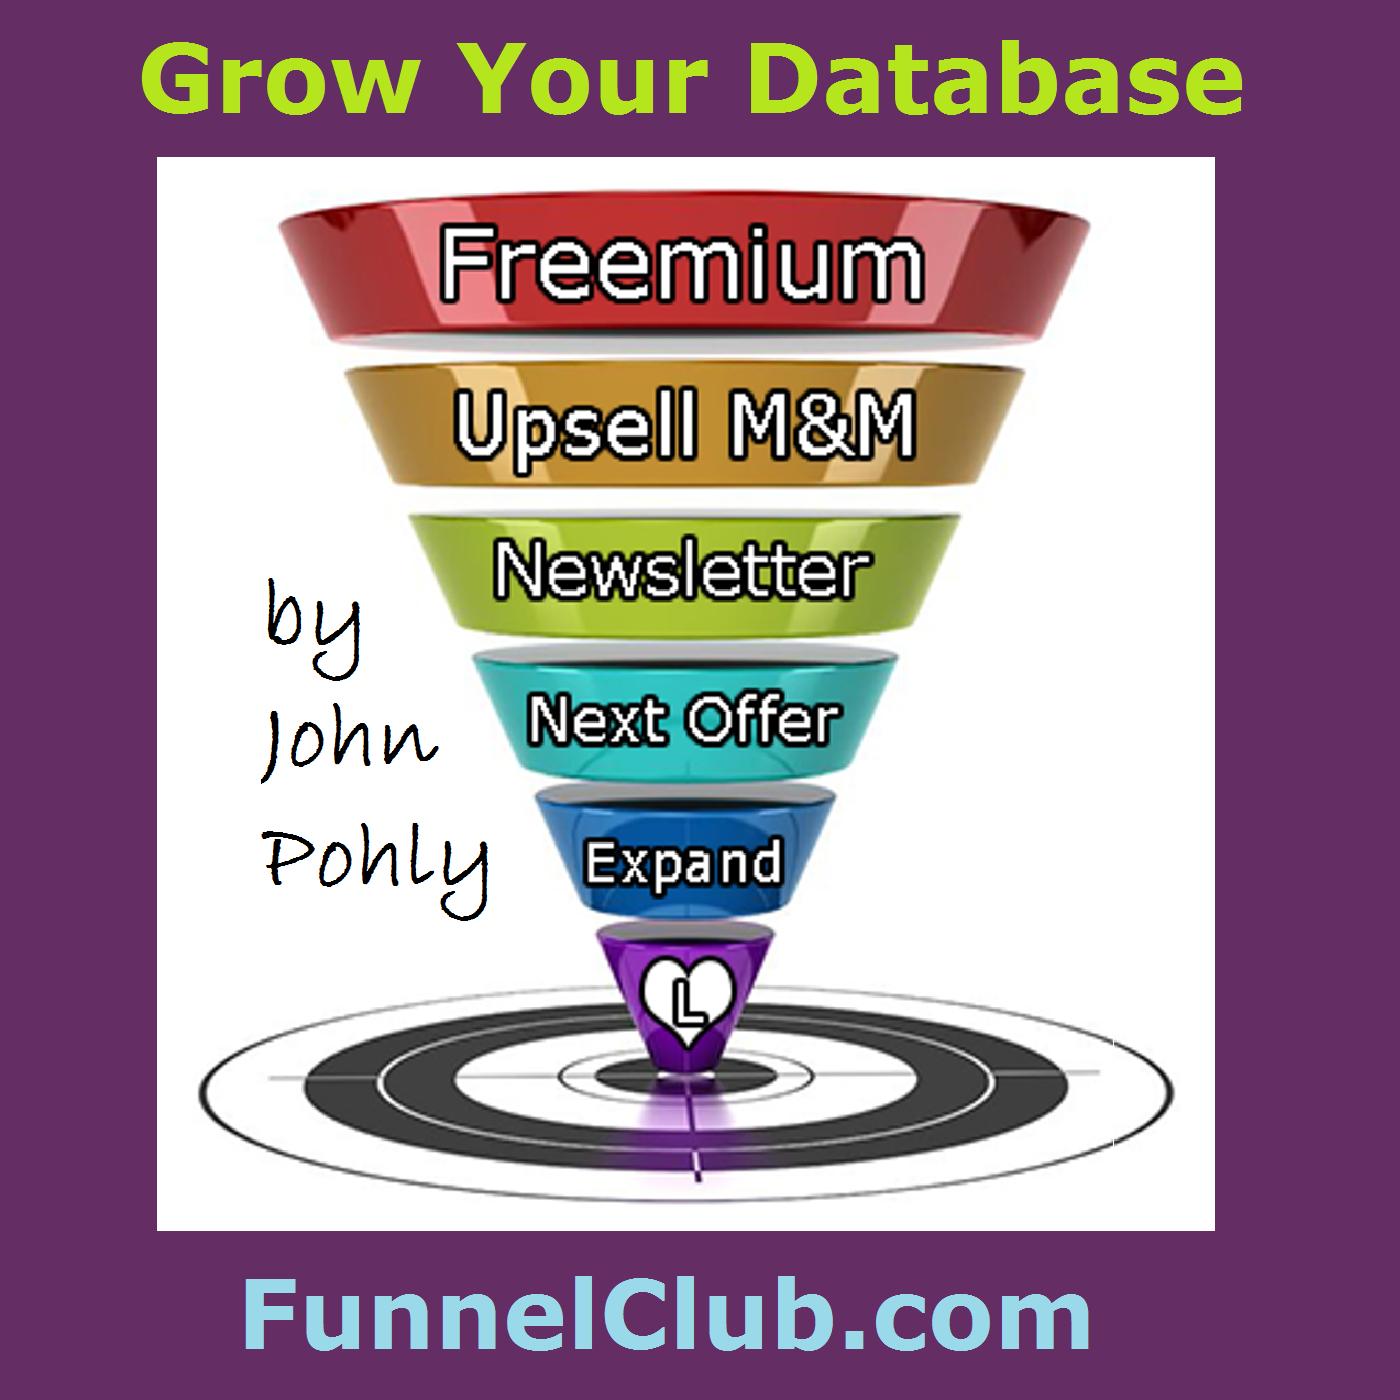 FunnelClub.com by John Pohly